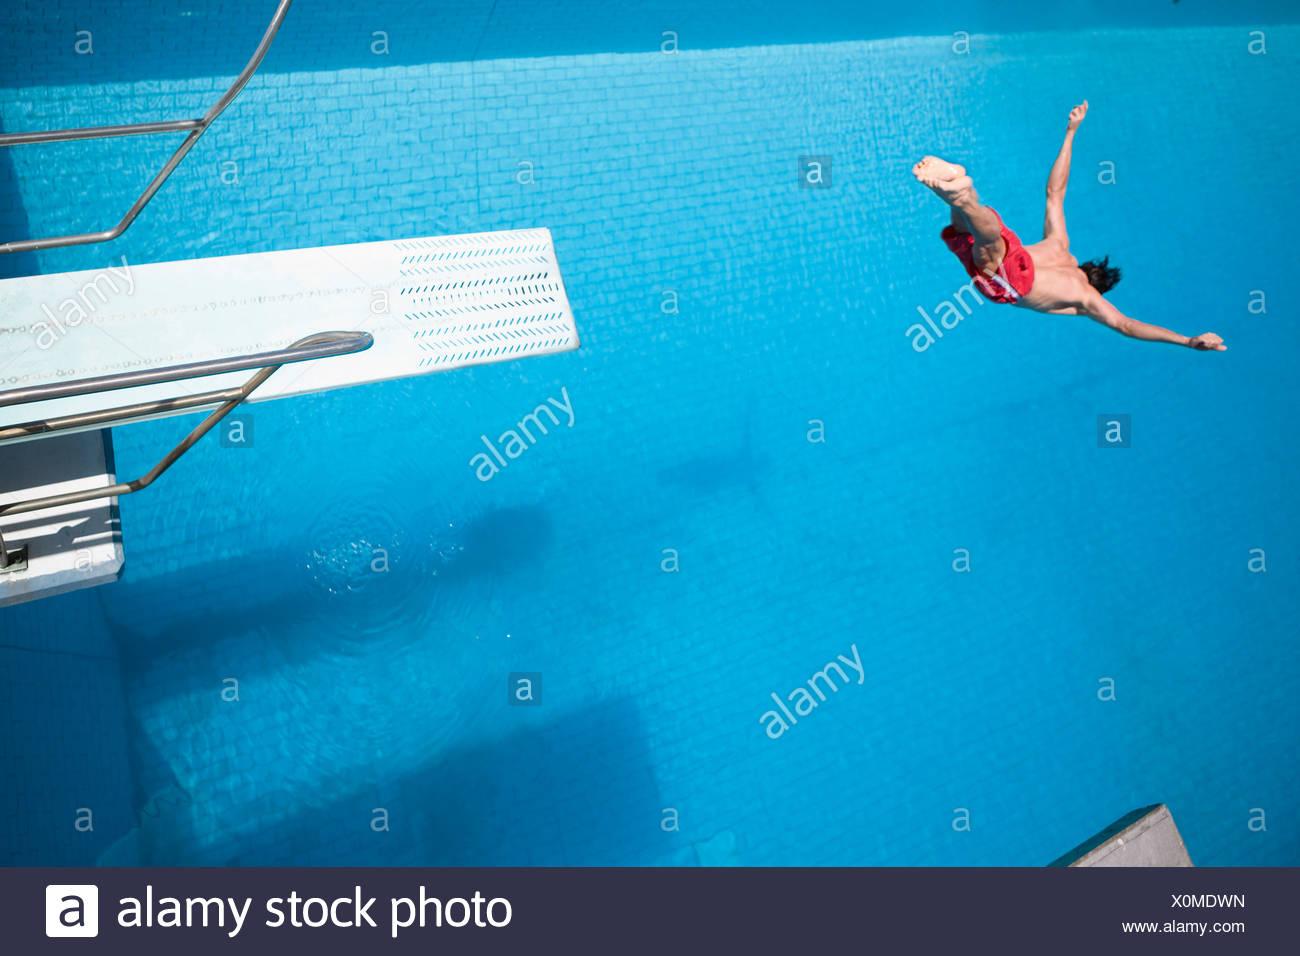 Hombre en una piscina de buceo Imagen De Stock